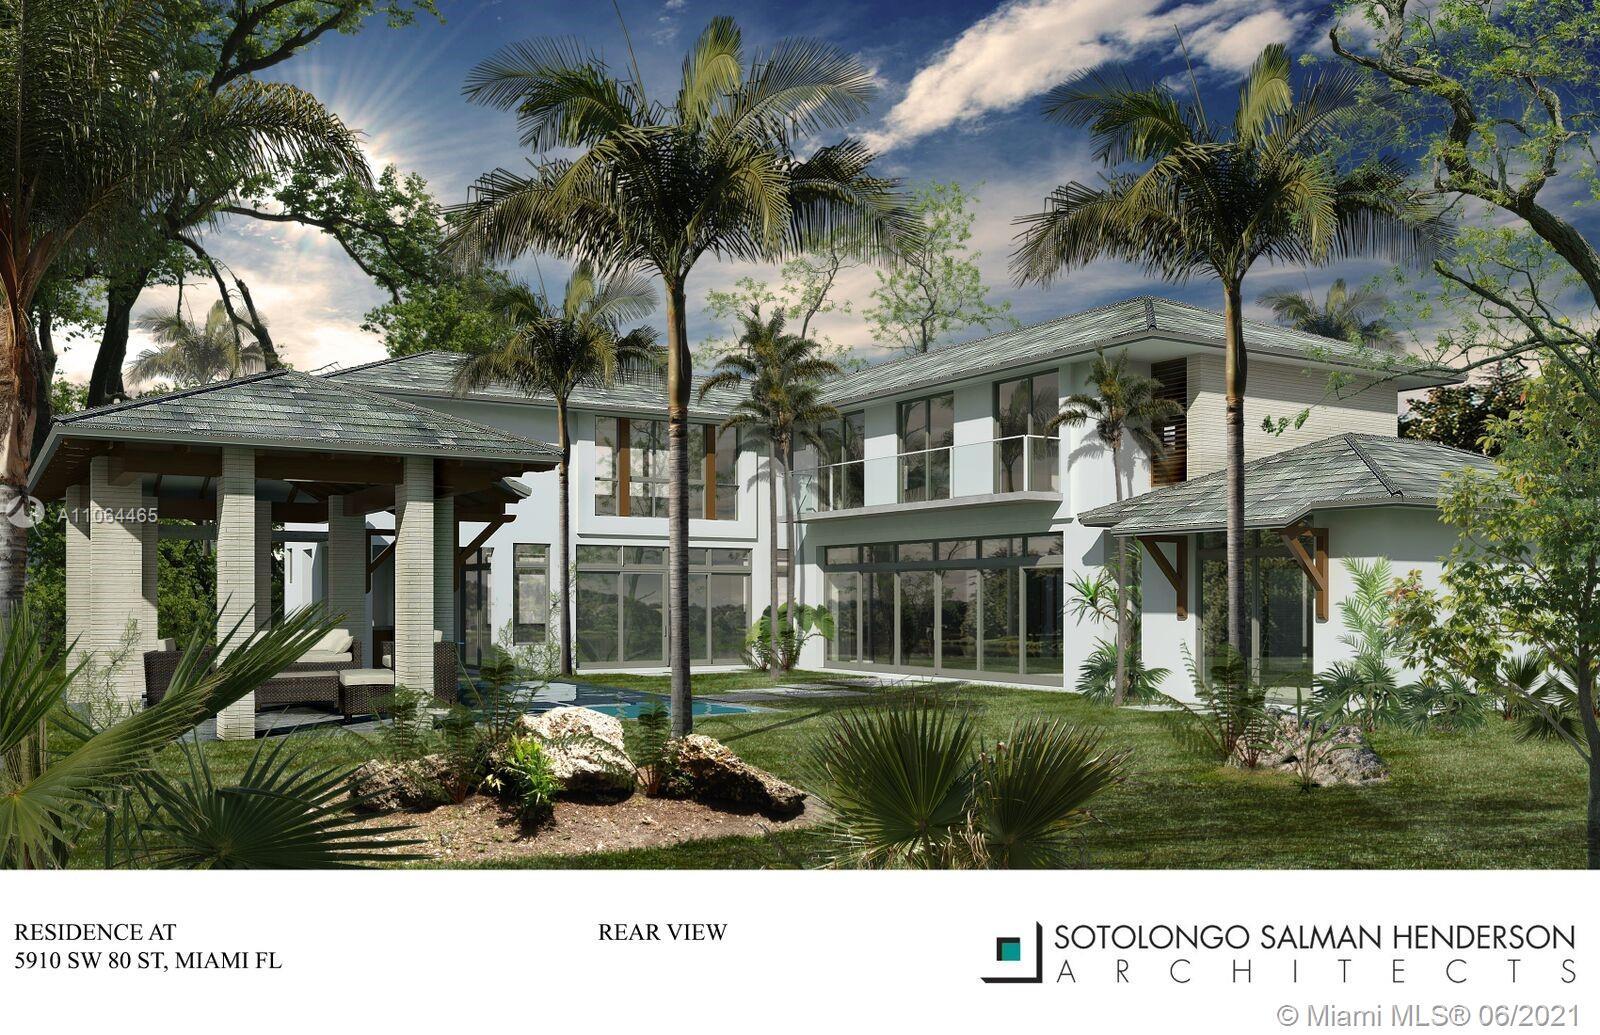 Palm Miami Heights - 5910 SW 80th St, South Miami, FL 33143